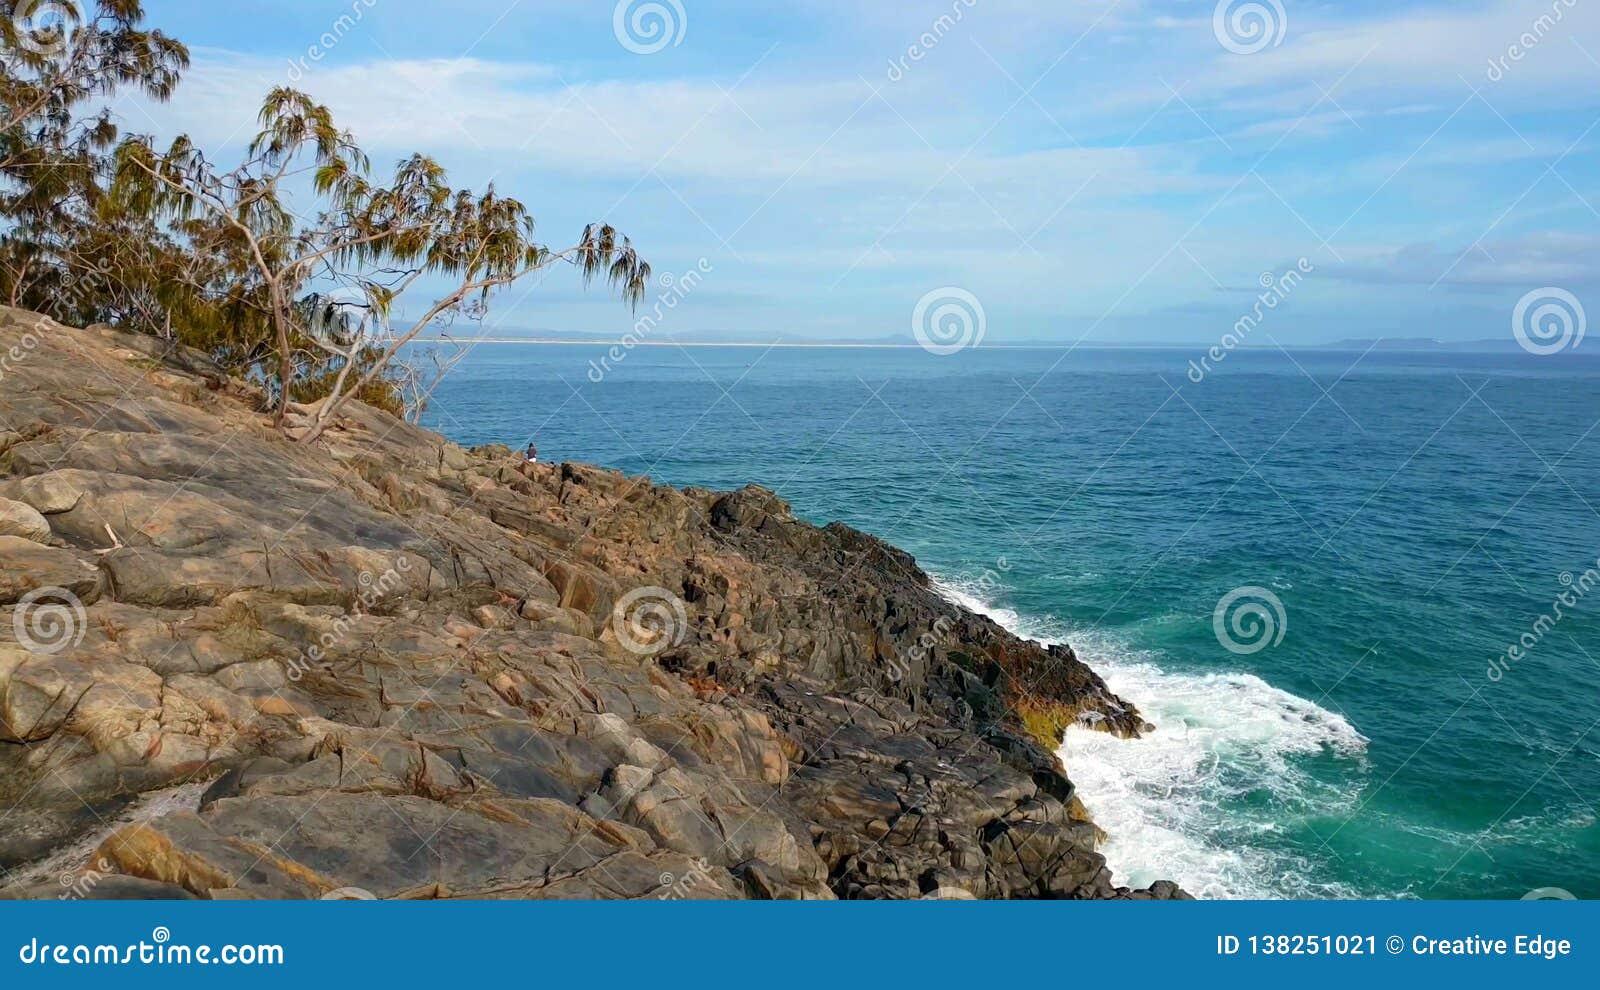 Noosa National Park on the Sunshine Coast, Queensland, Australia